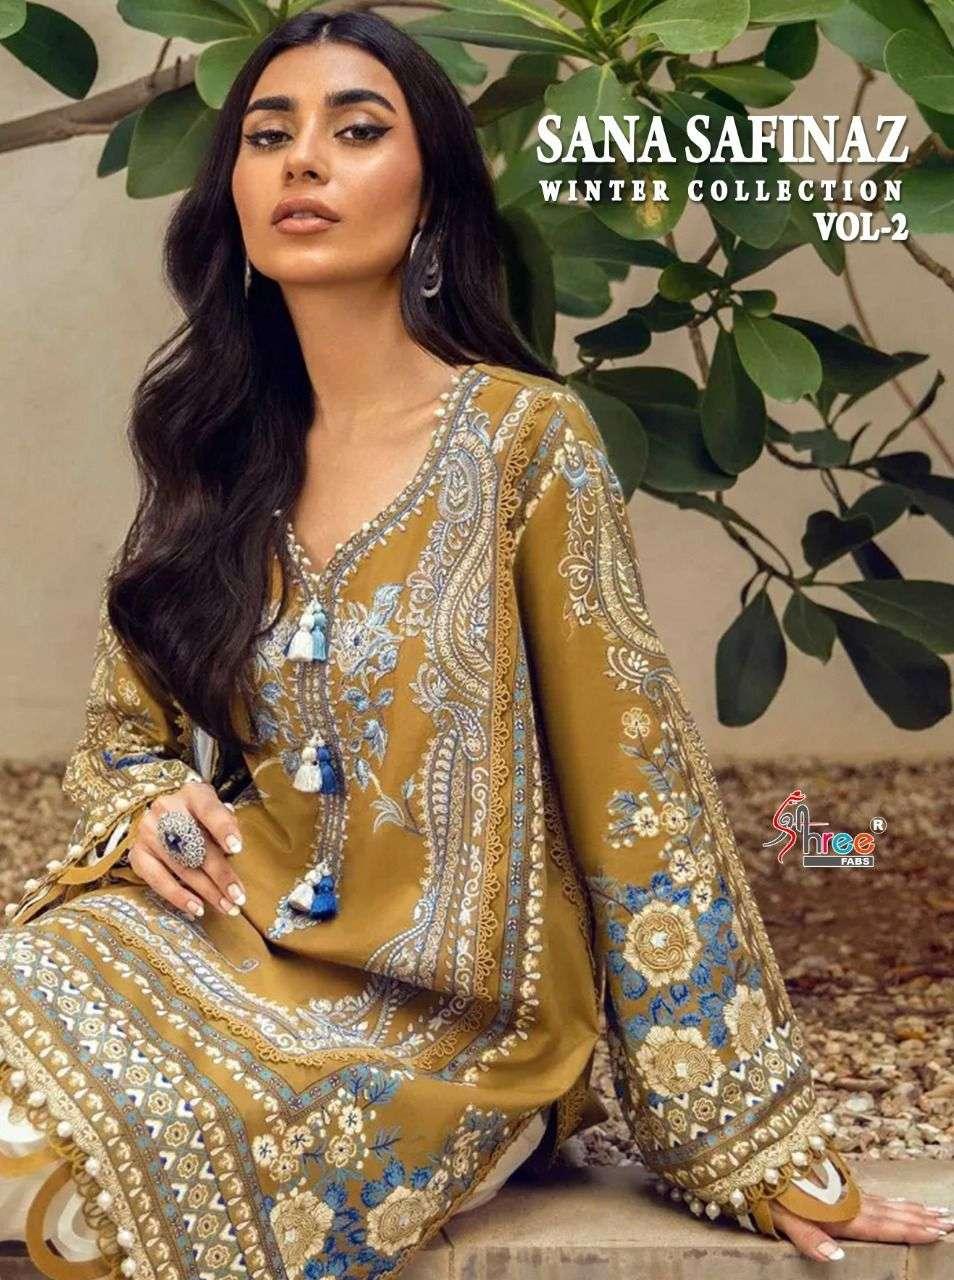 Shree fabs launch sana safinaz vol 2 pashmina designer salwaar kameez